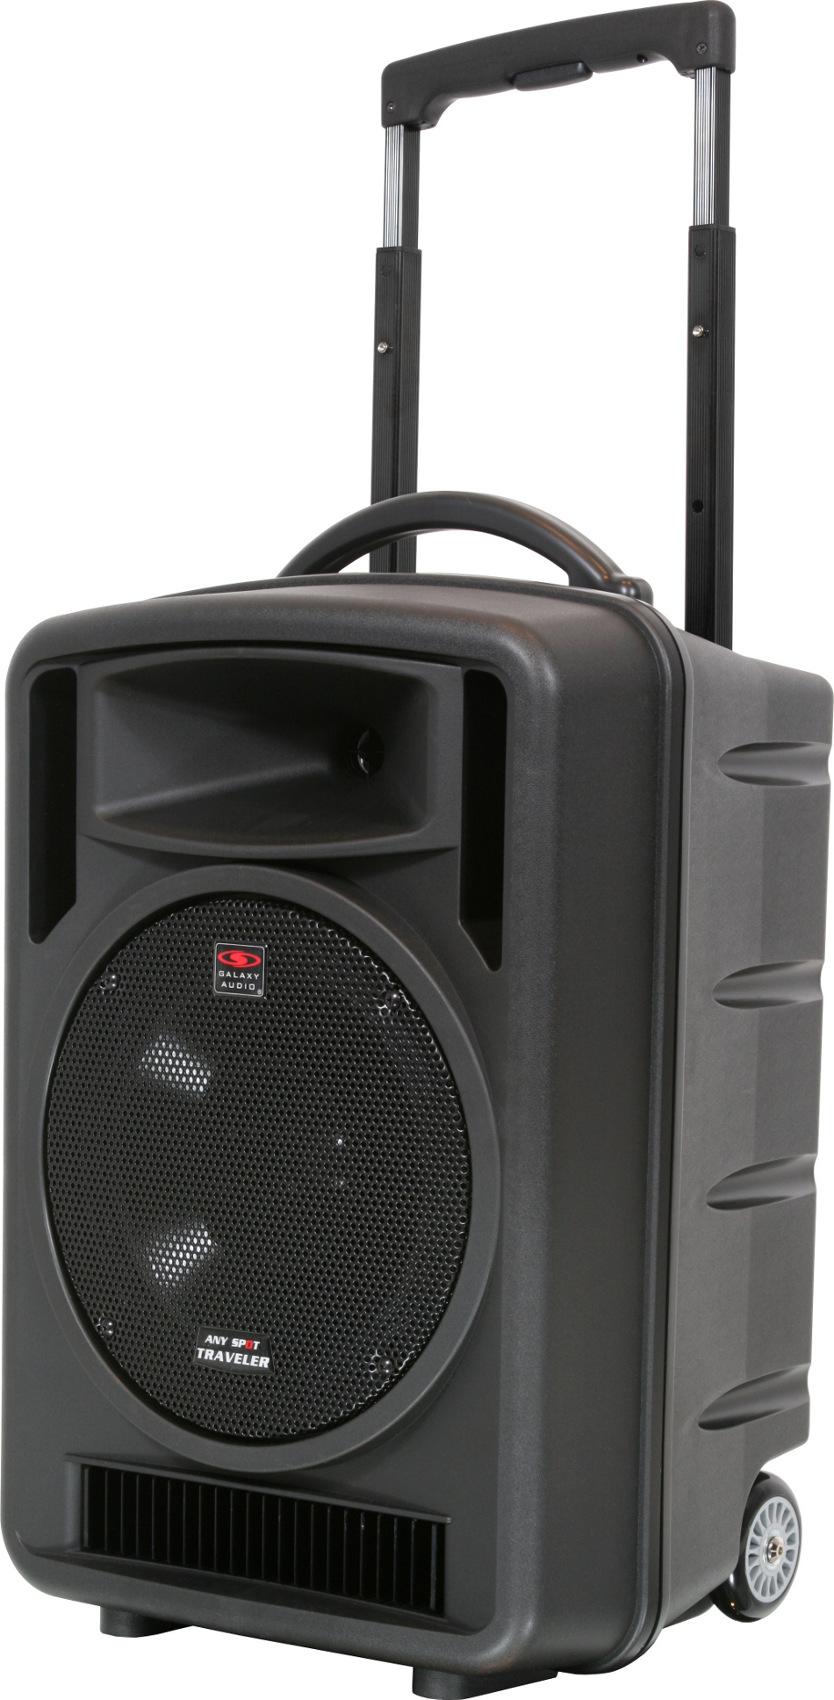 PA System, Traveler 10, w/CD Player